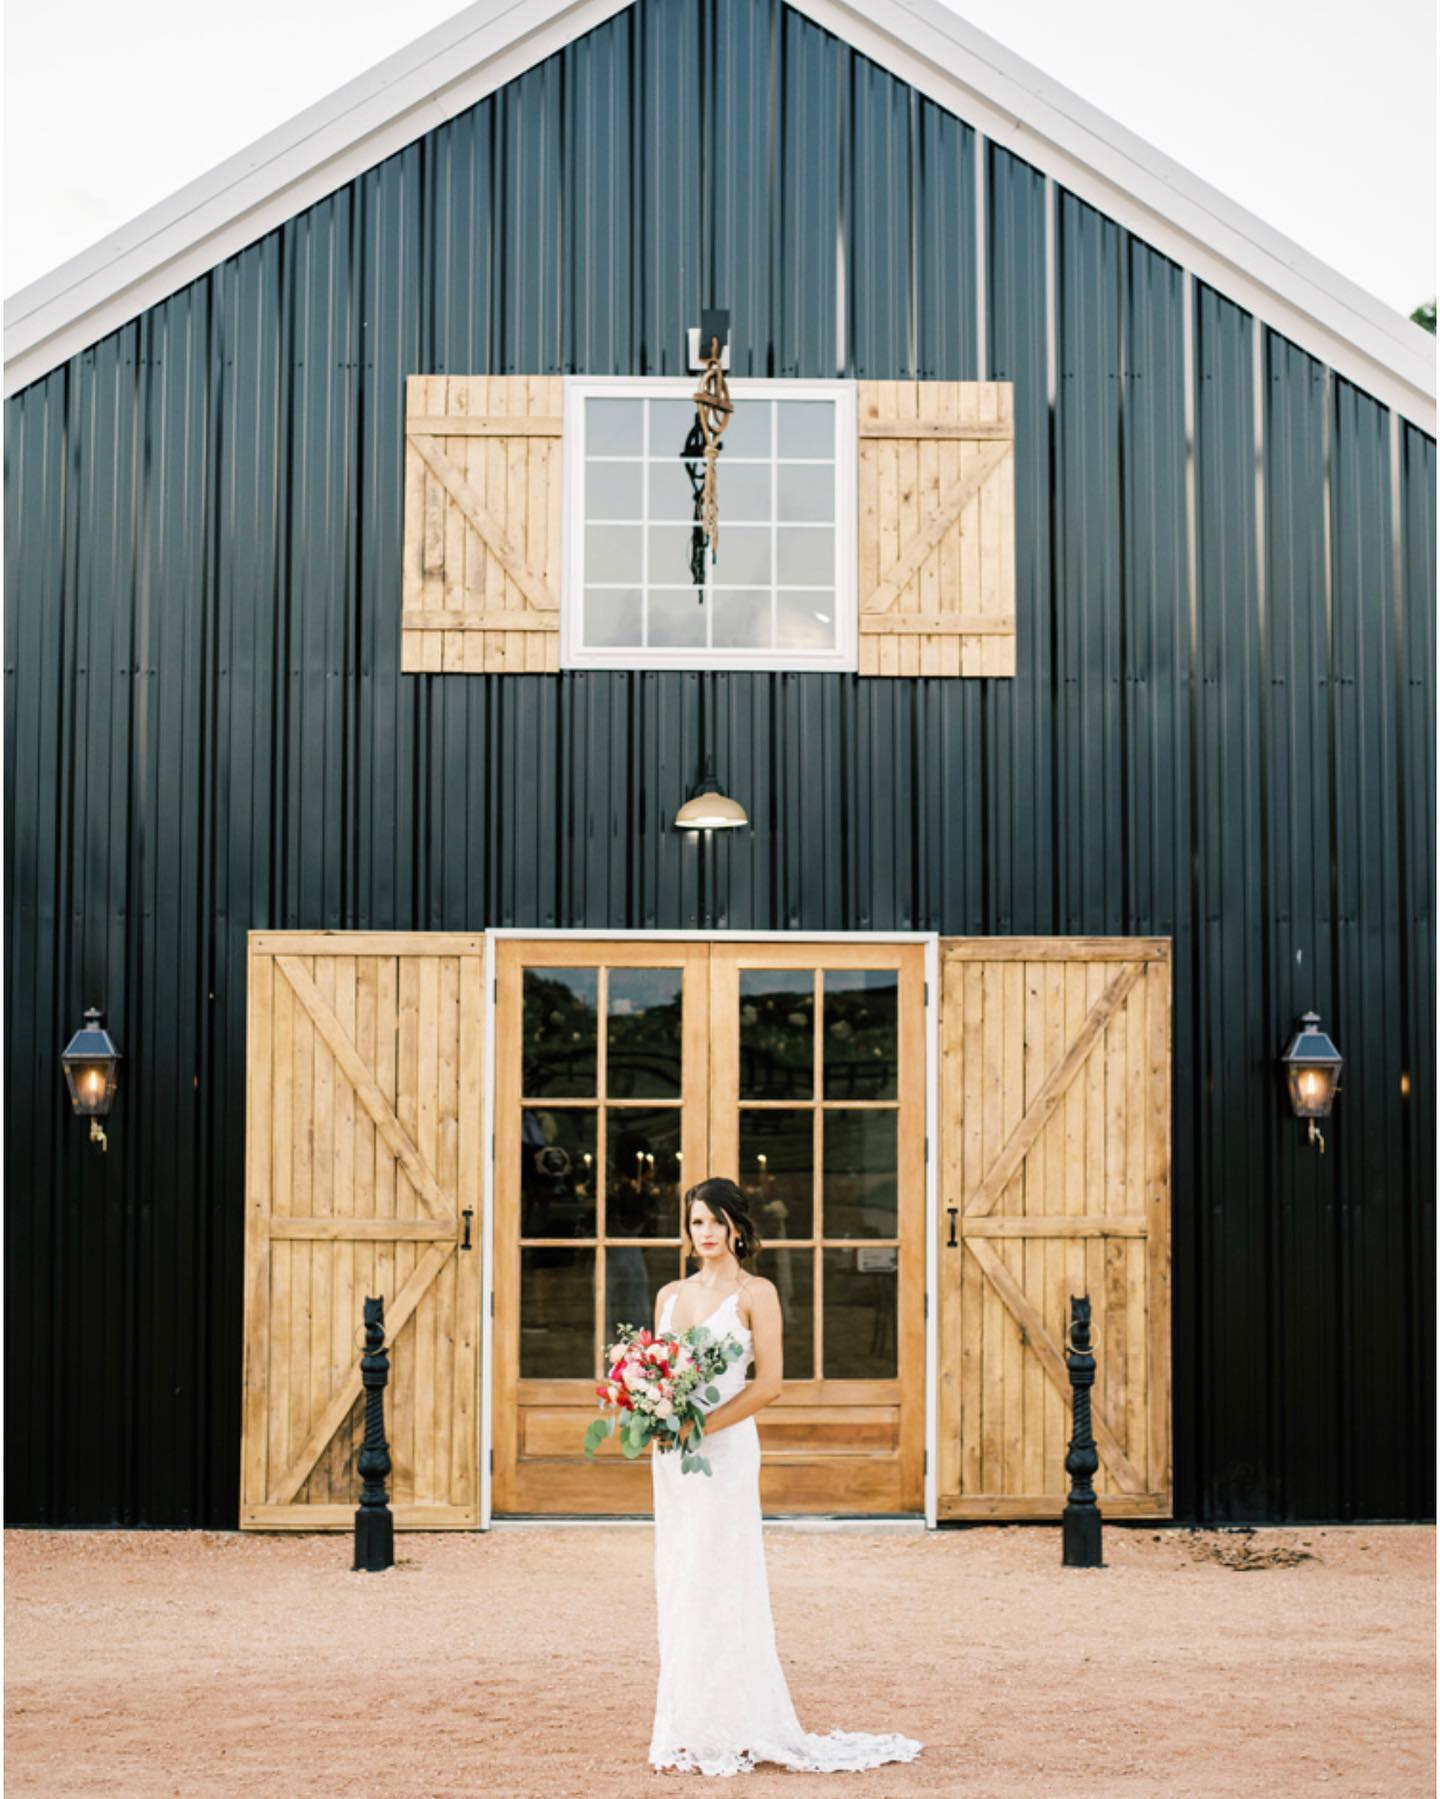 Thistle Hill Estate - Dallas, Texas - DFW Wedding Venue - Wedding Chapel - Barn Event Venue